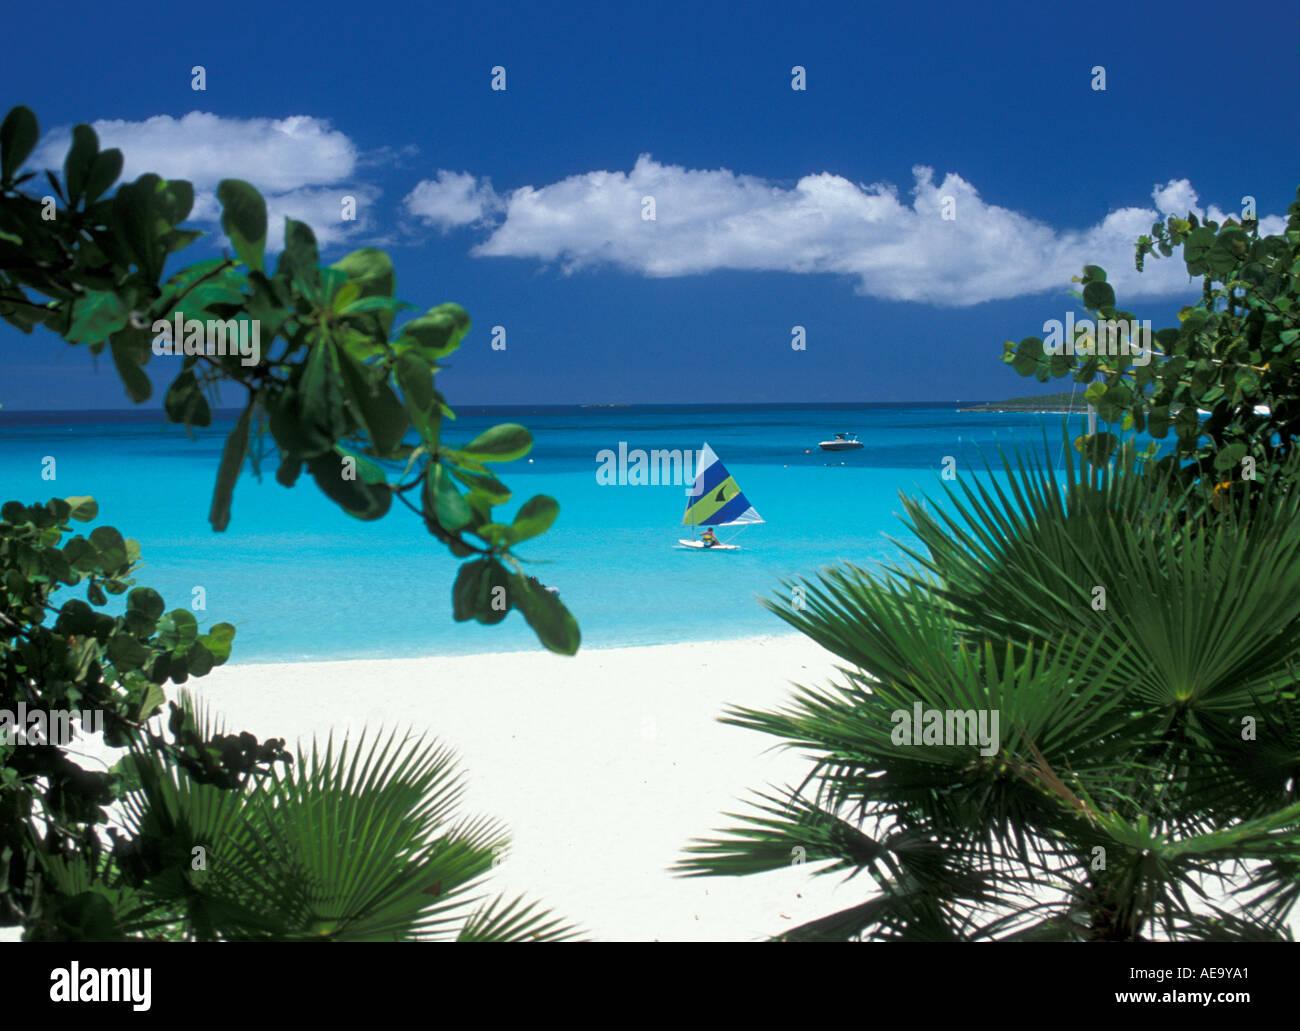 maunday-s-bay-anguilla-at-cap-juluca-resort-hotel-peering-through-AE9YA1.jpg